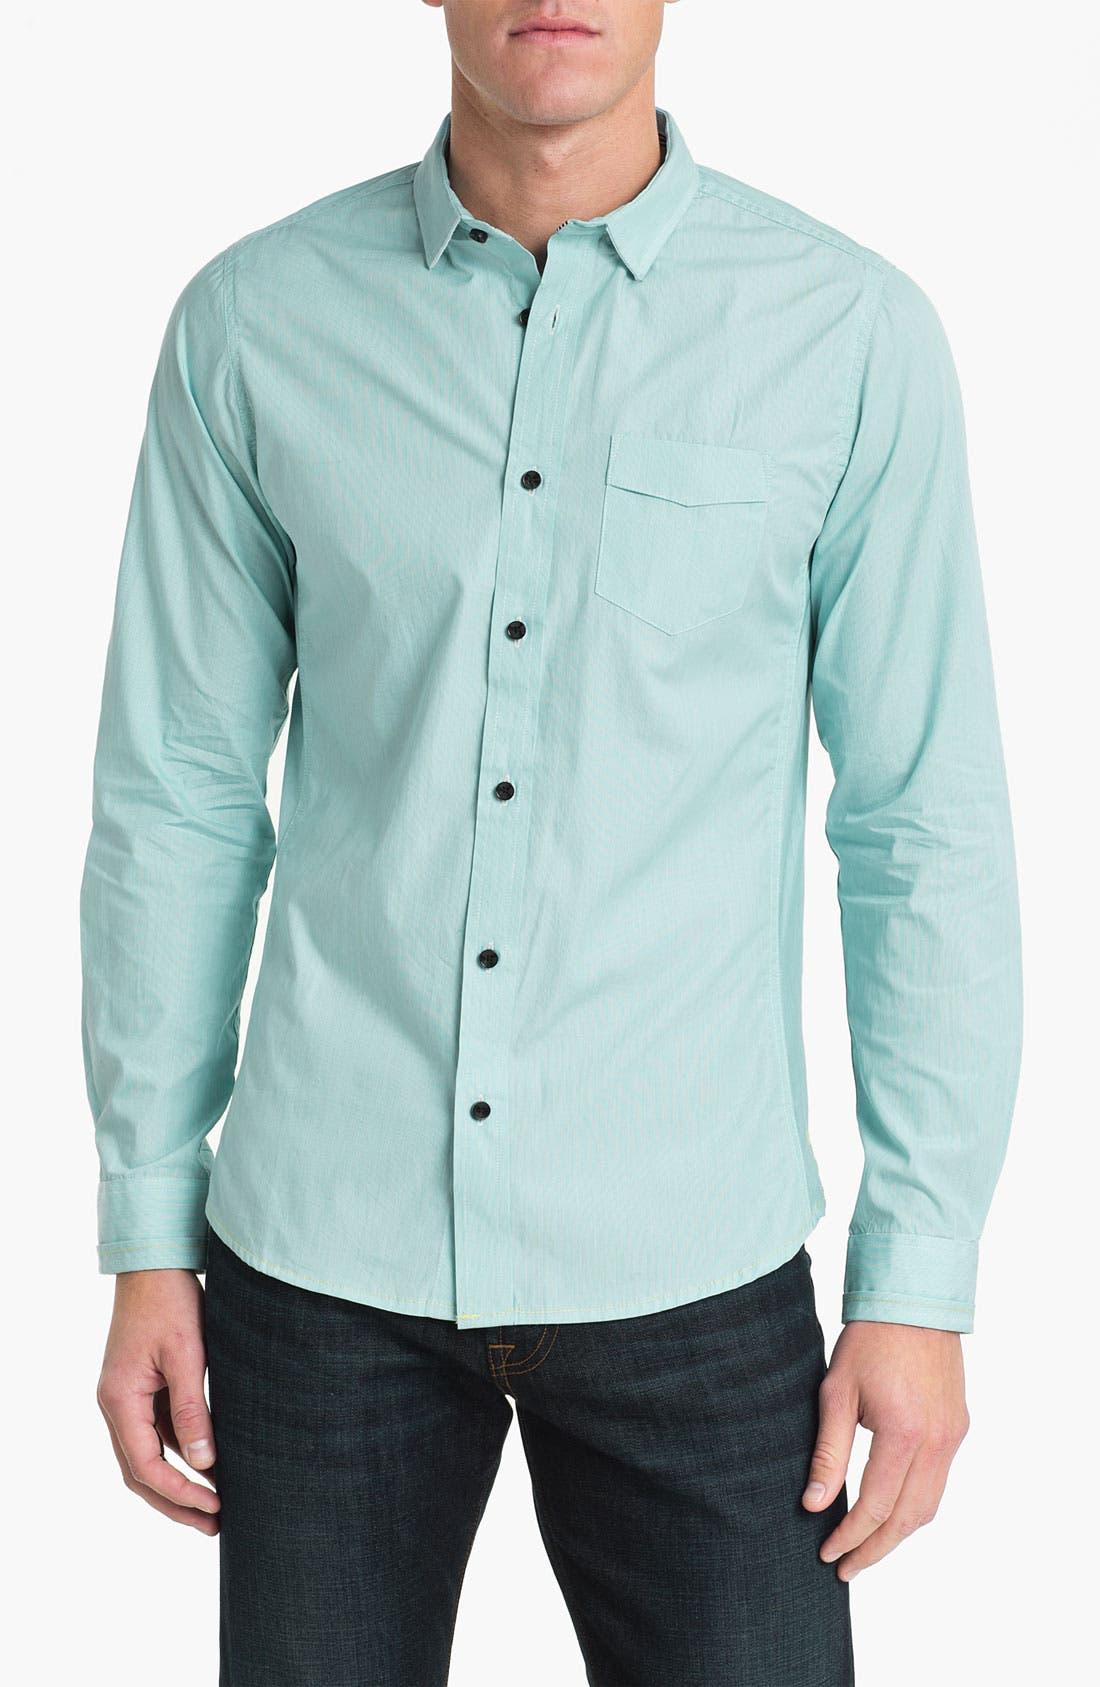 Main Image - Descendant of Thieves Fine Stripe Woven Shirt